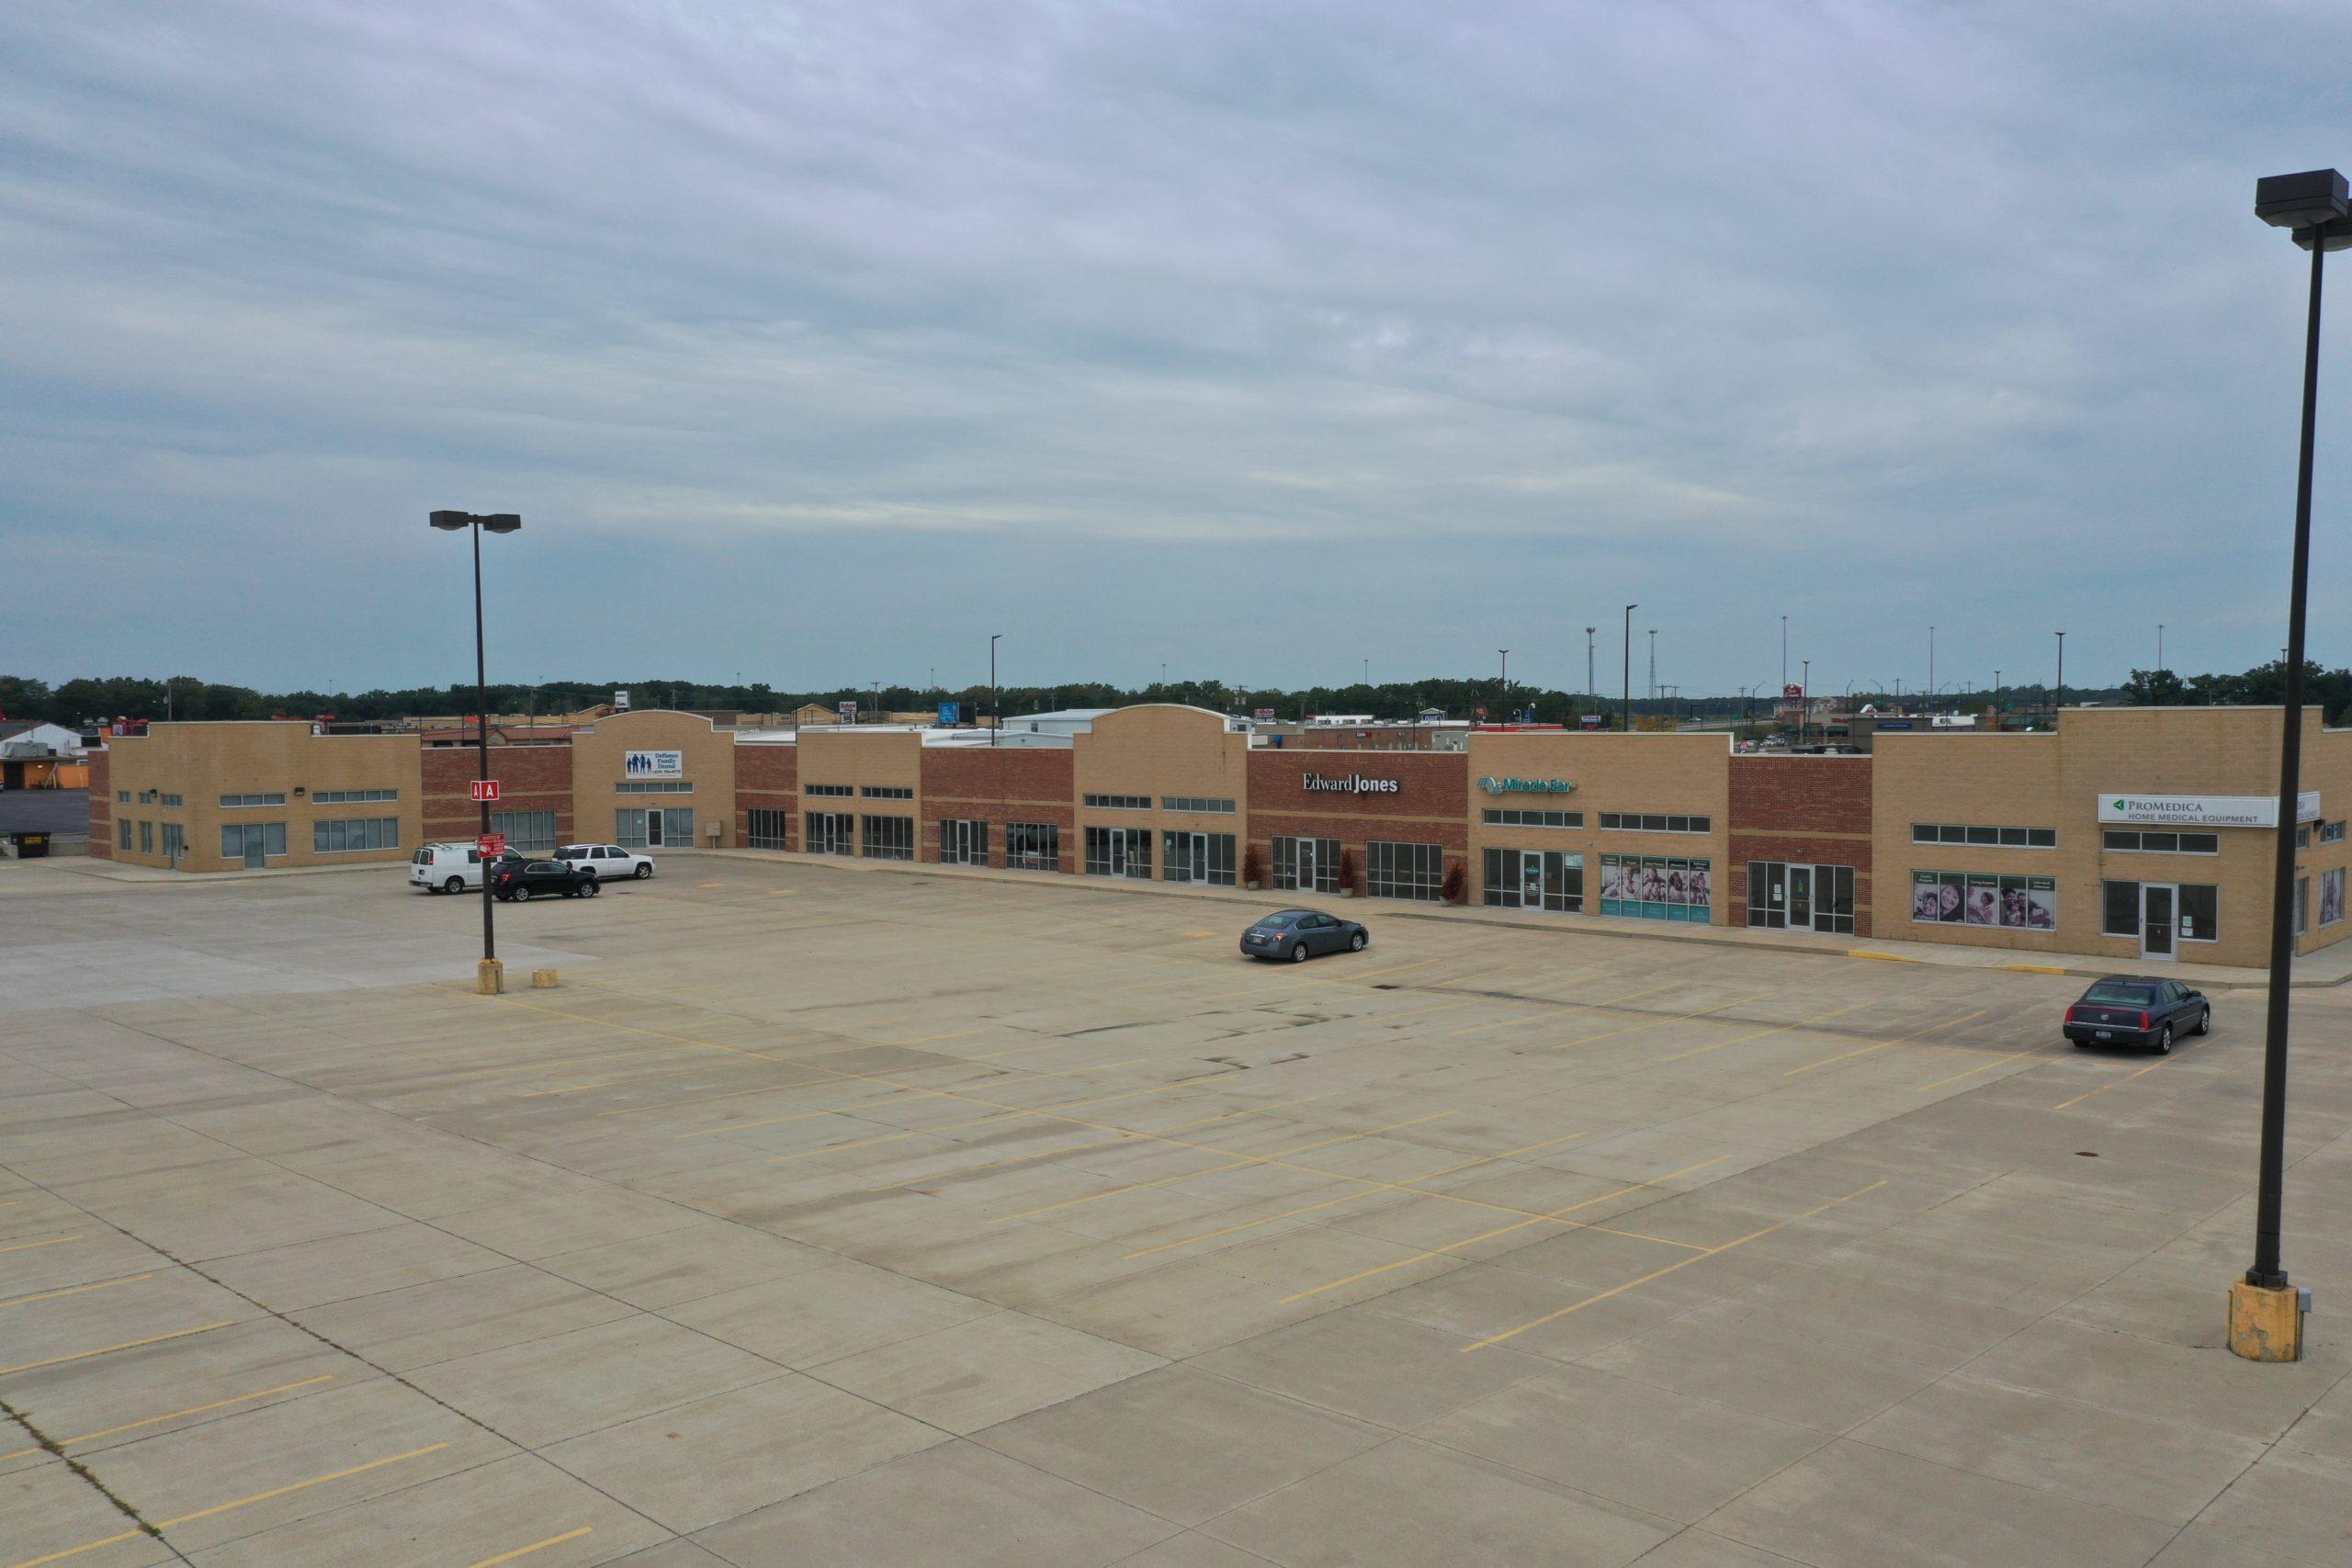 Stadium Plaza – Defiance, Ohio